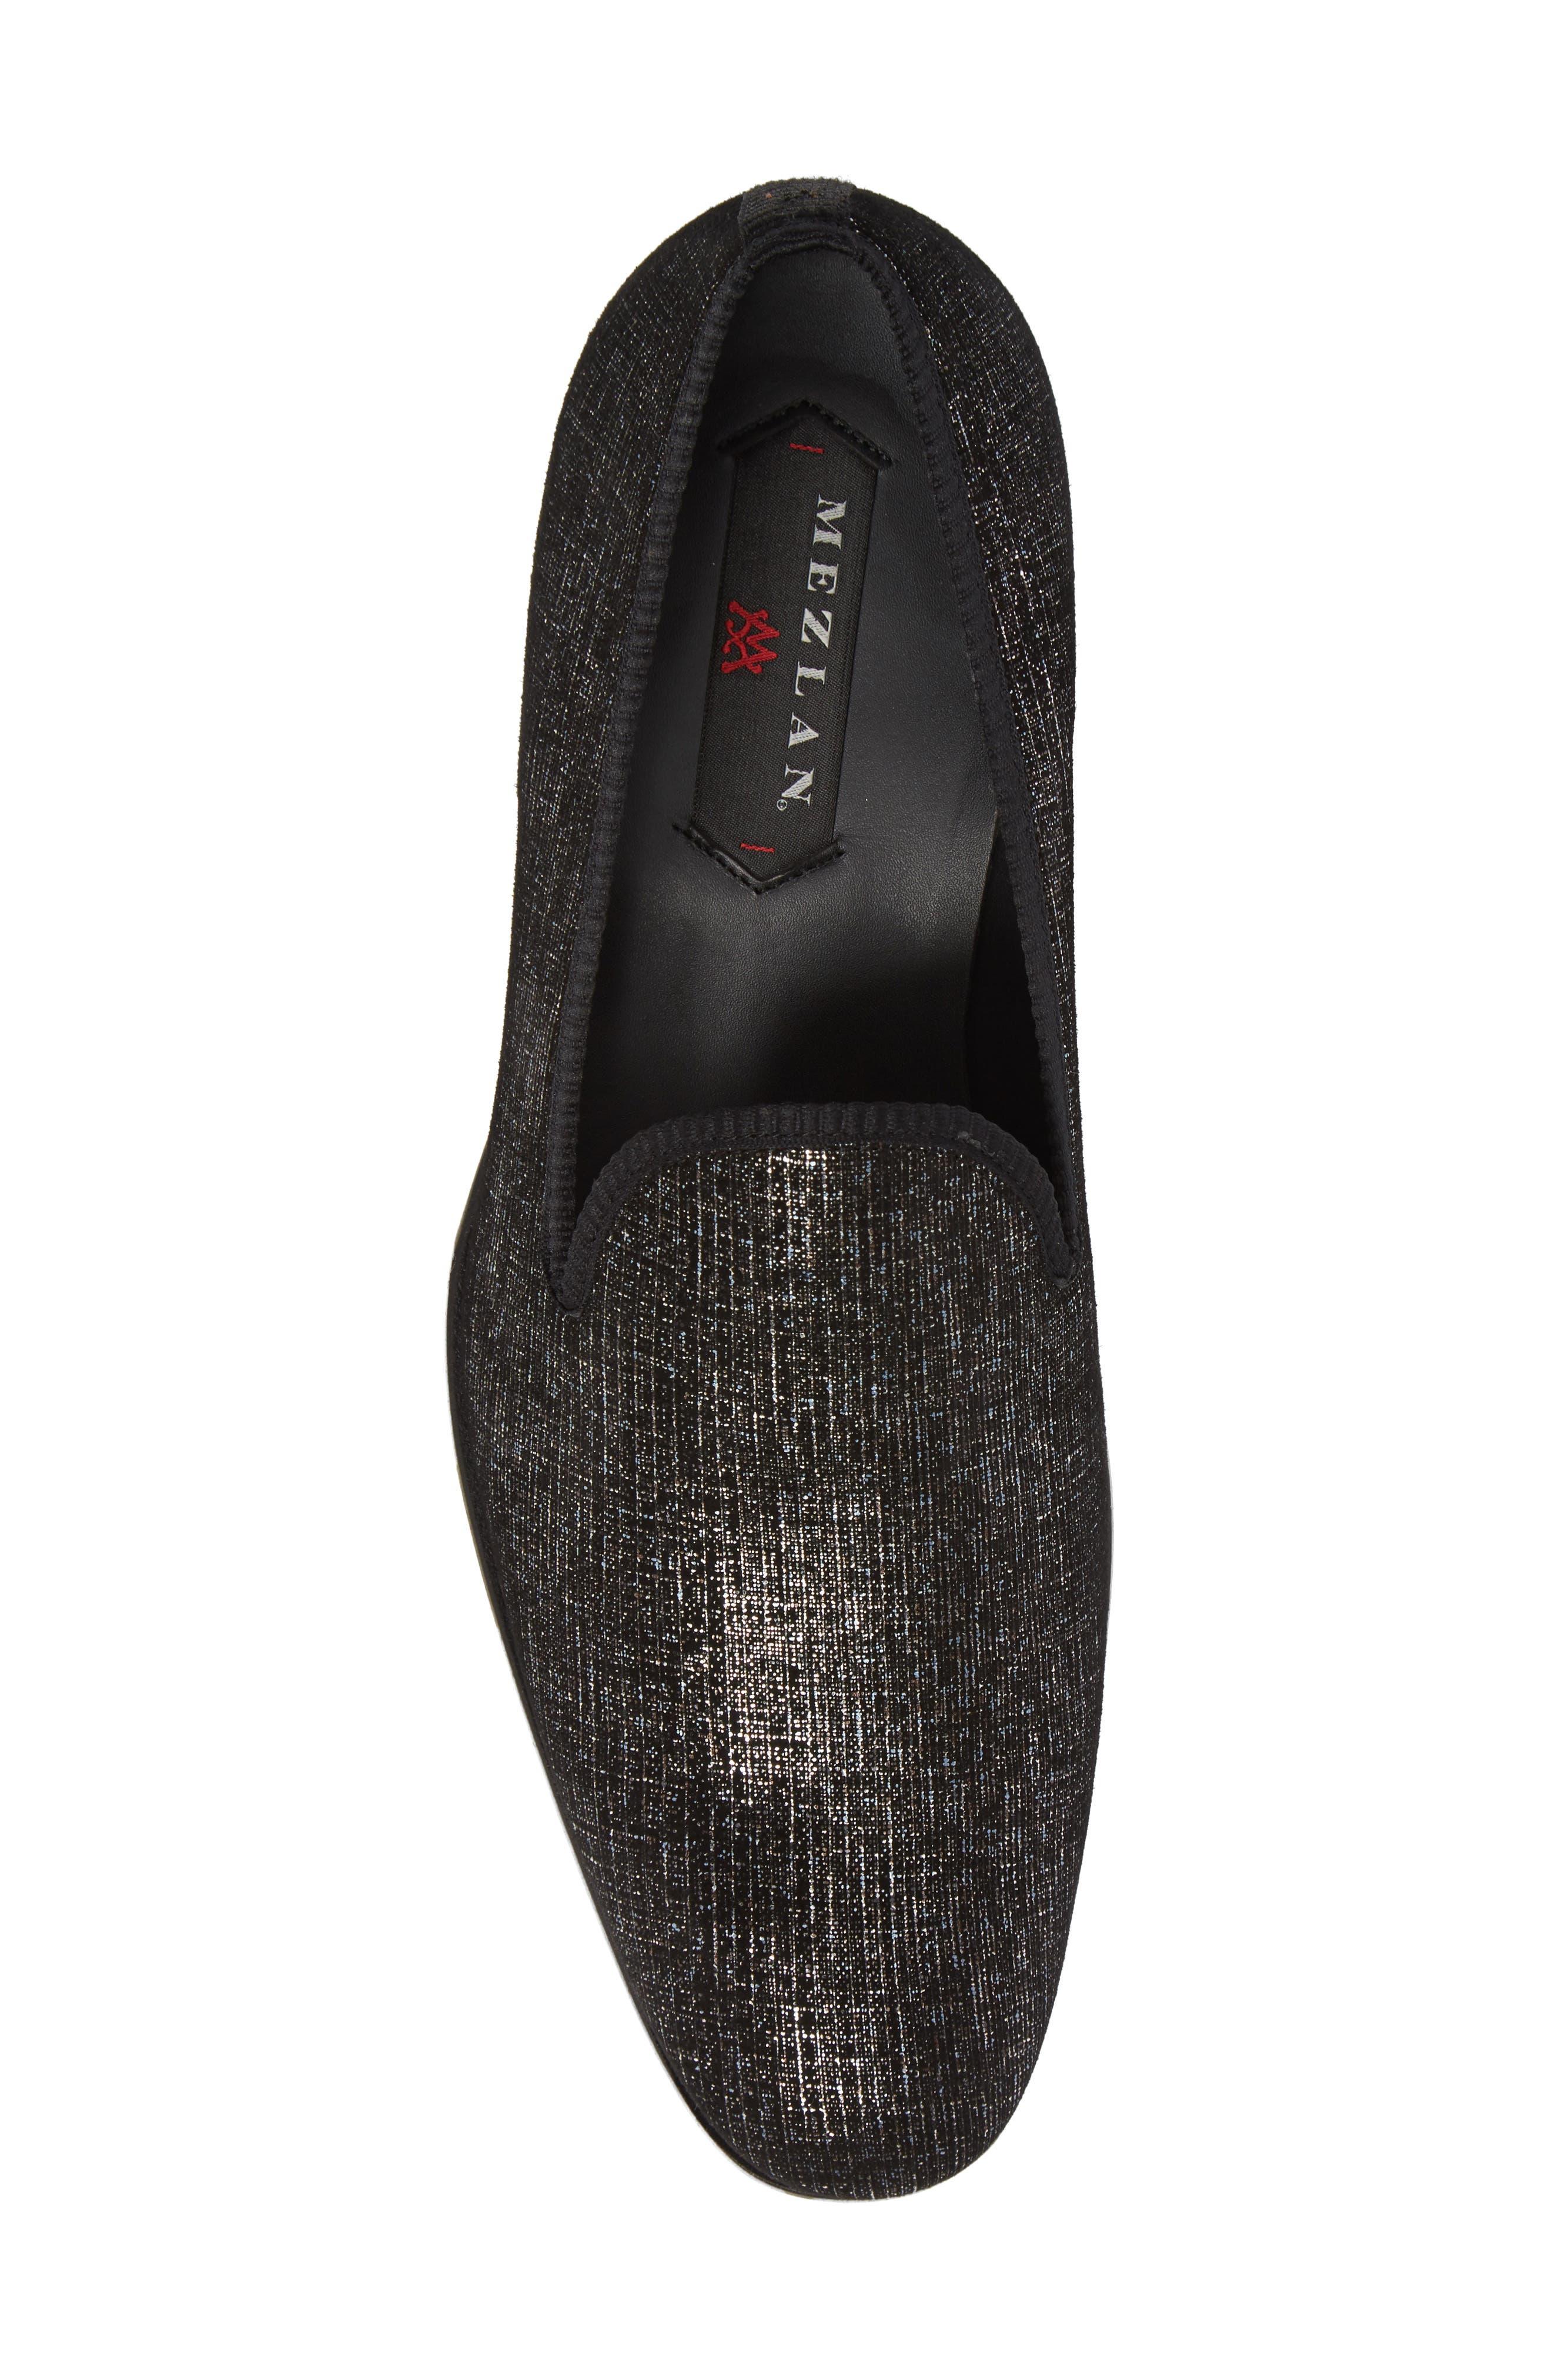 Belona Venetian Loafer,                             Alternate thumbnail 5, color,                             Grey Suede